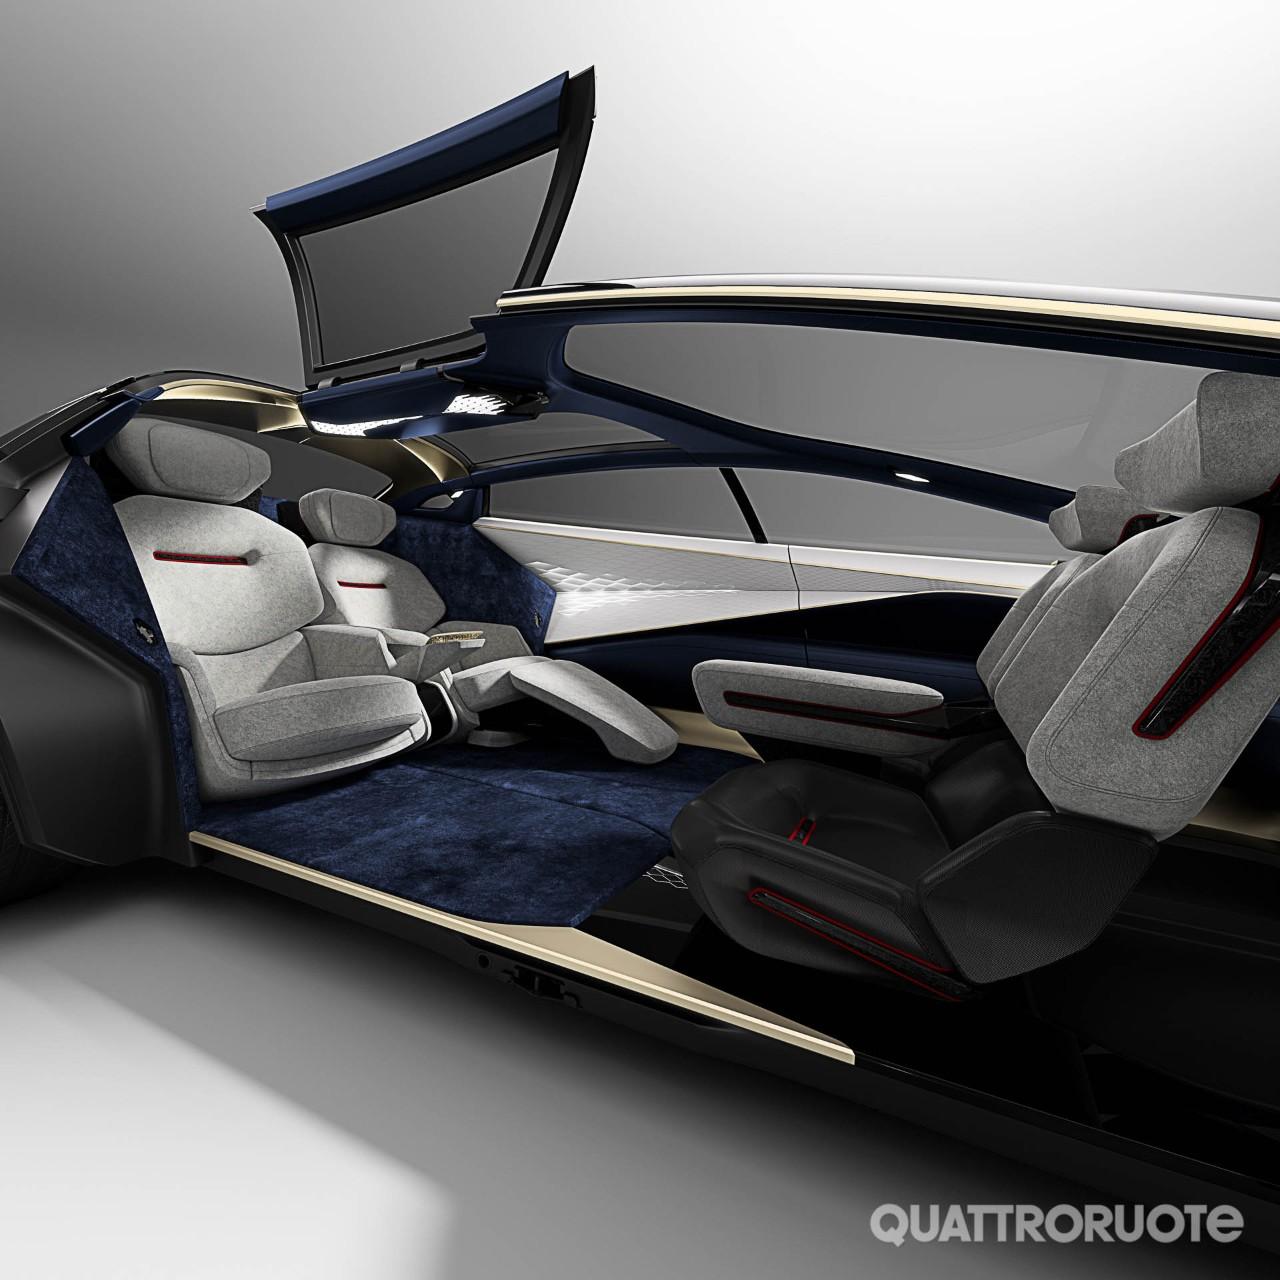 2018-Aston-Lagonda-Vision-Concept-2.jpg